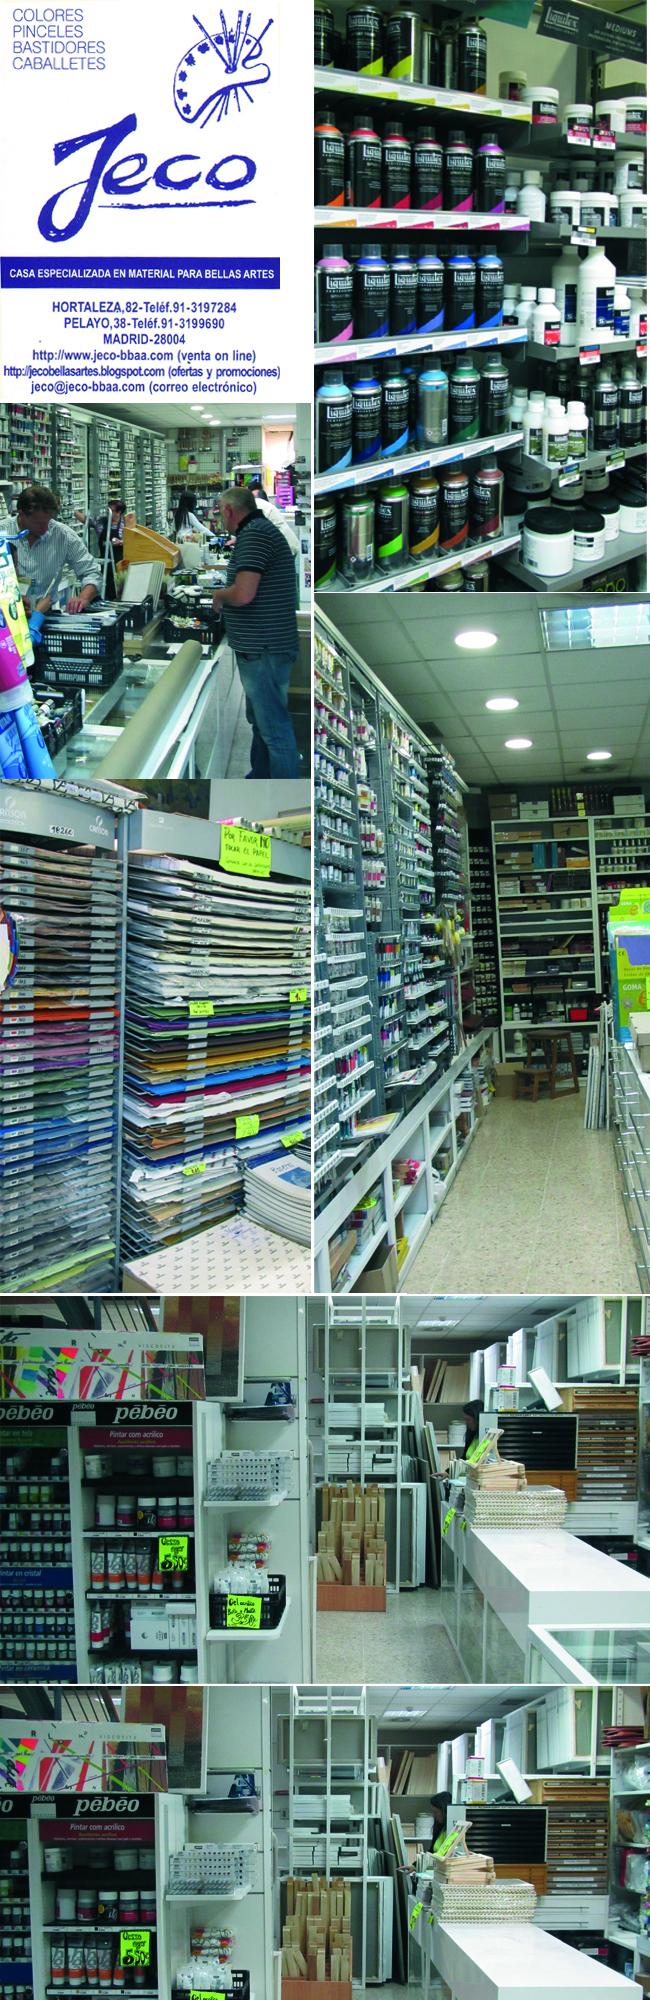 tiendas-aerografia-comic-pinturas-acuarelas-acrilicos-pinceles-lapices-tiendas-madrid